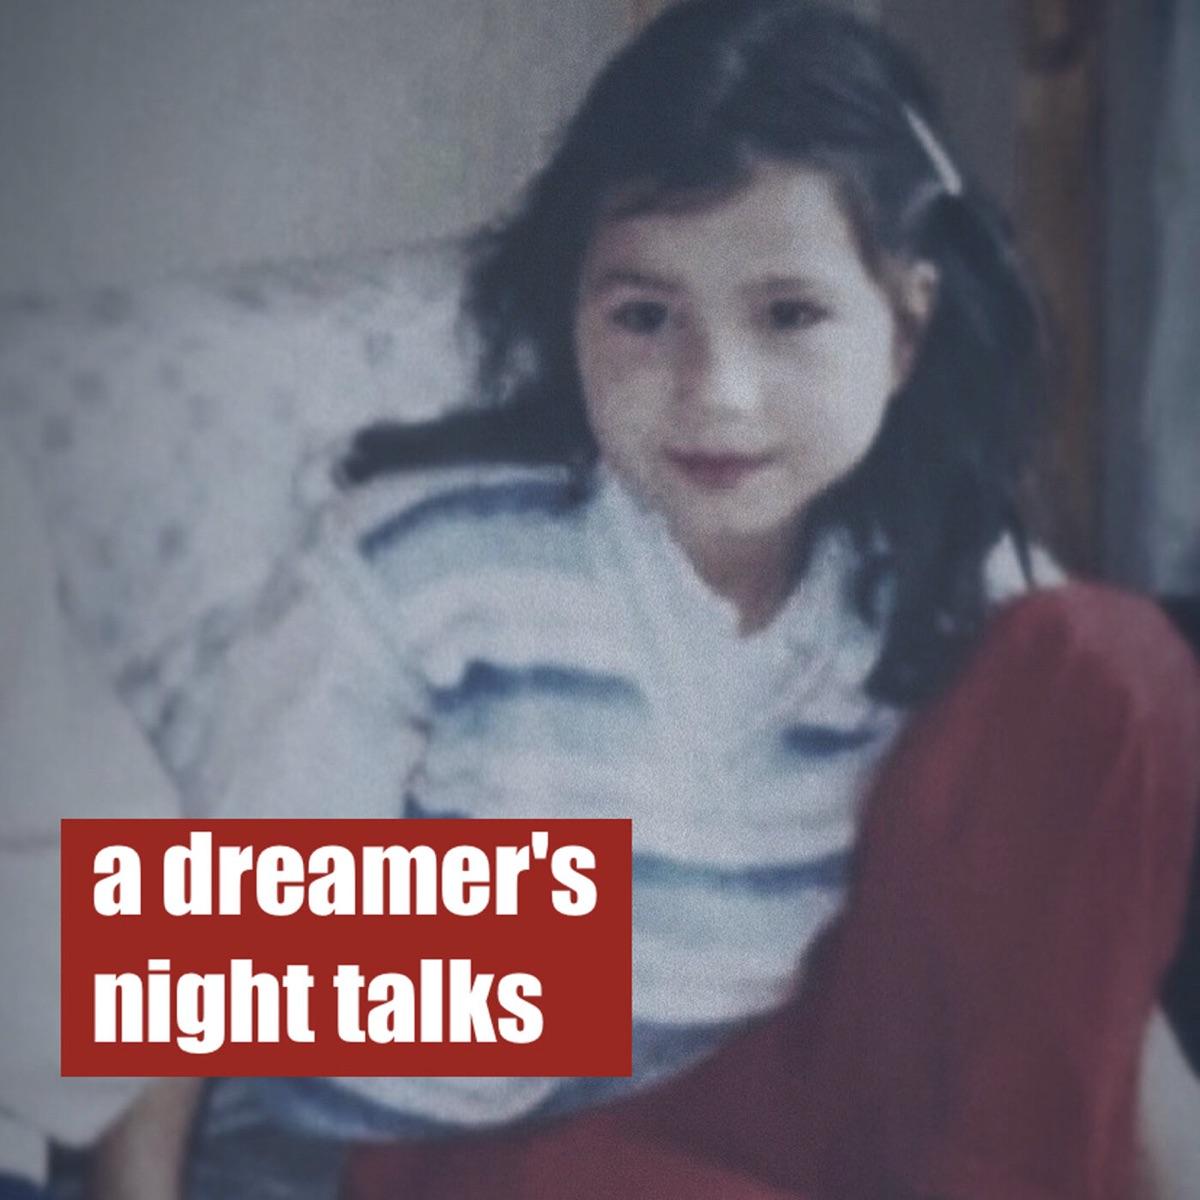 a dreamer's night talks